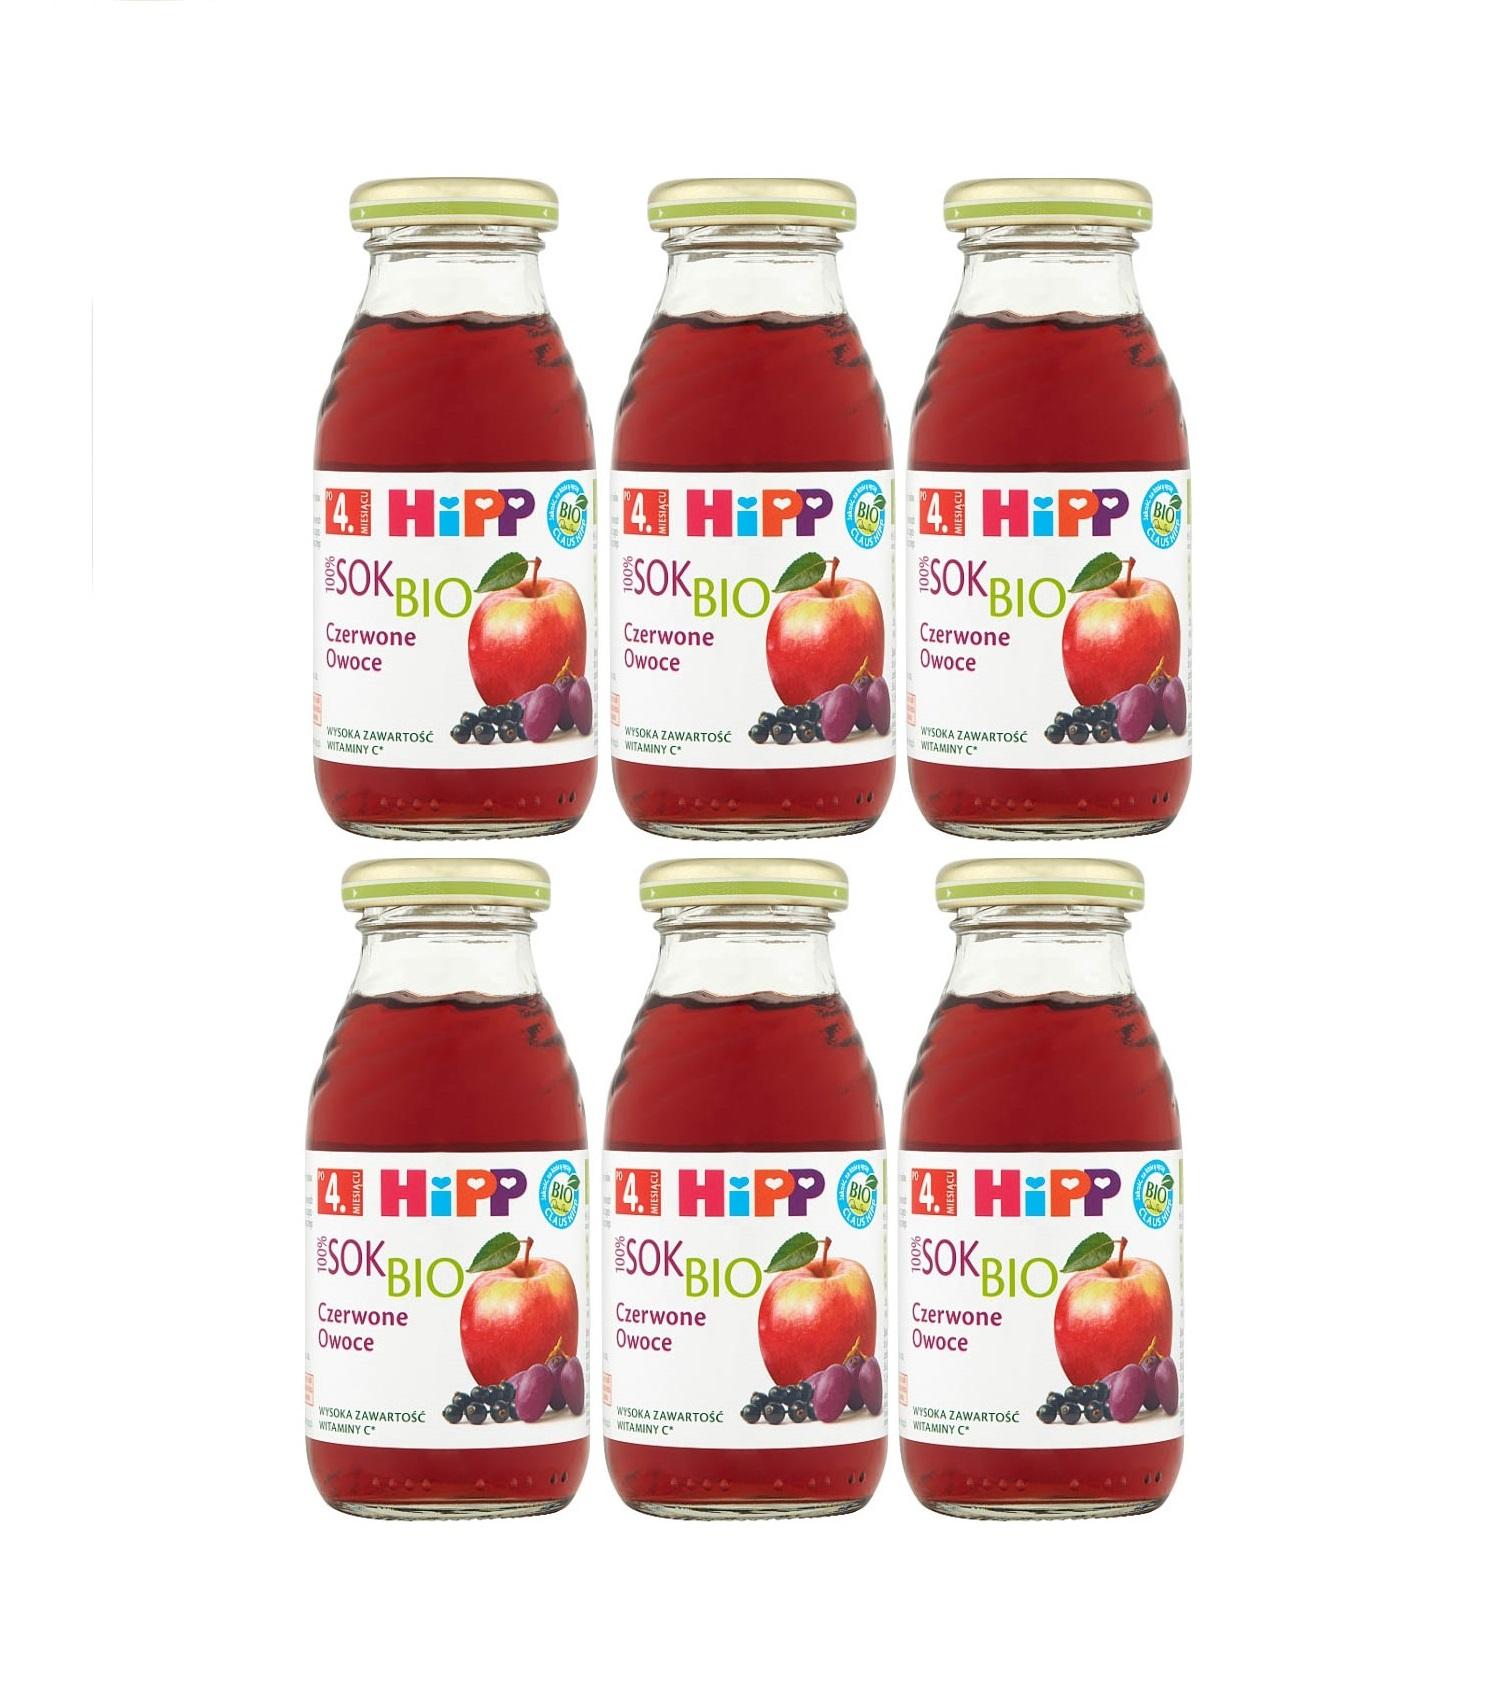 6 pack hipp 200ml sok czerwone owoce